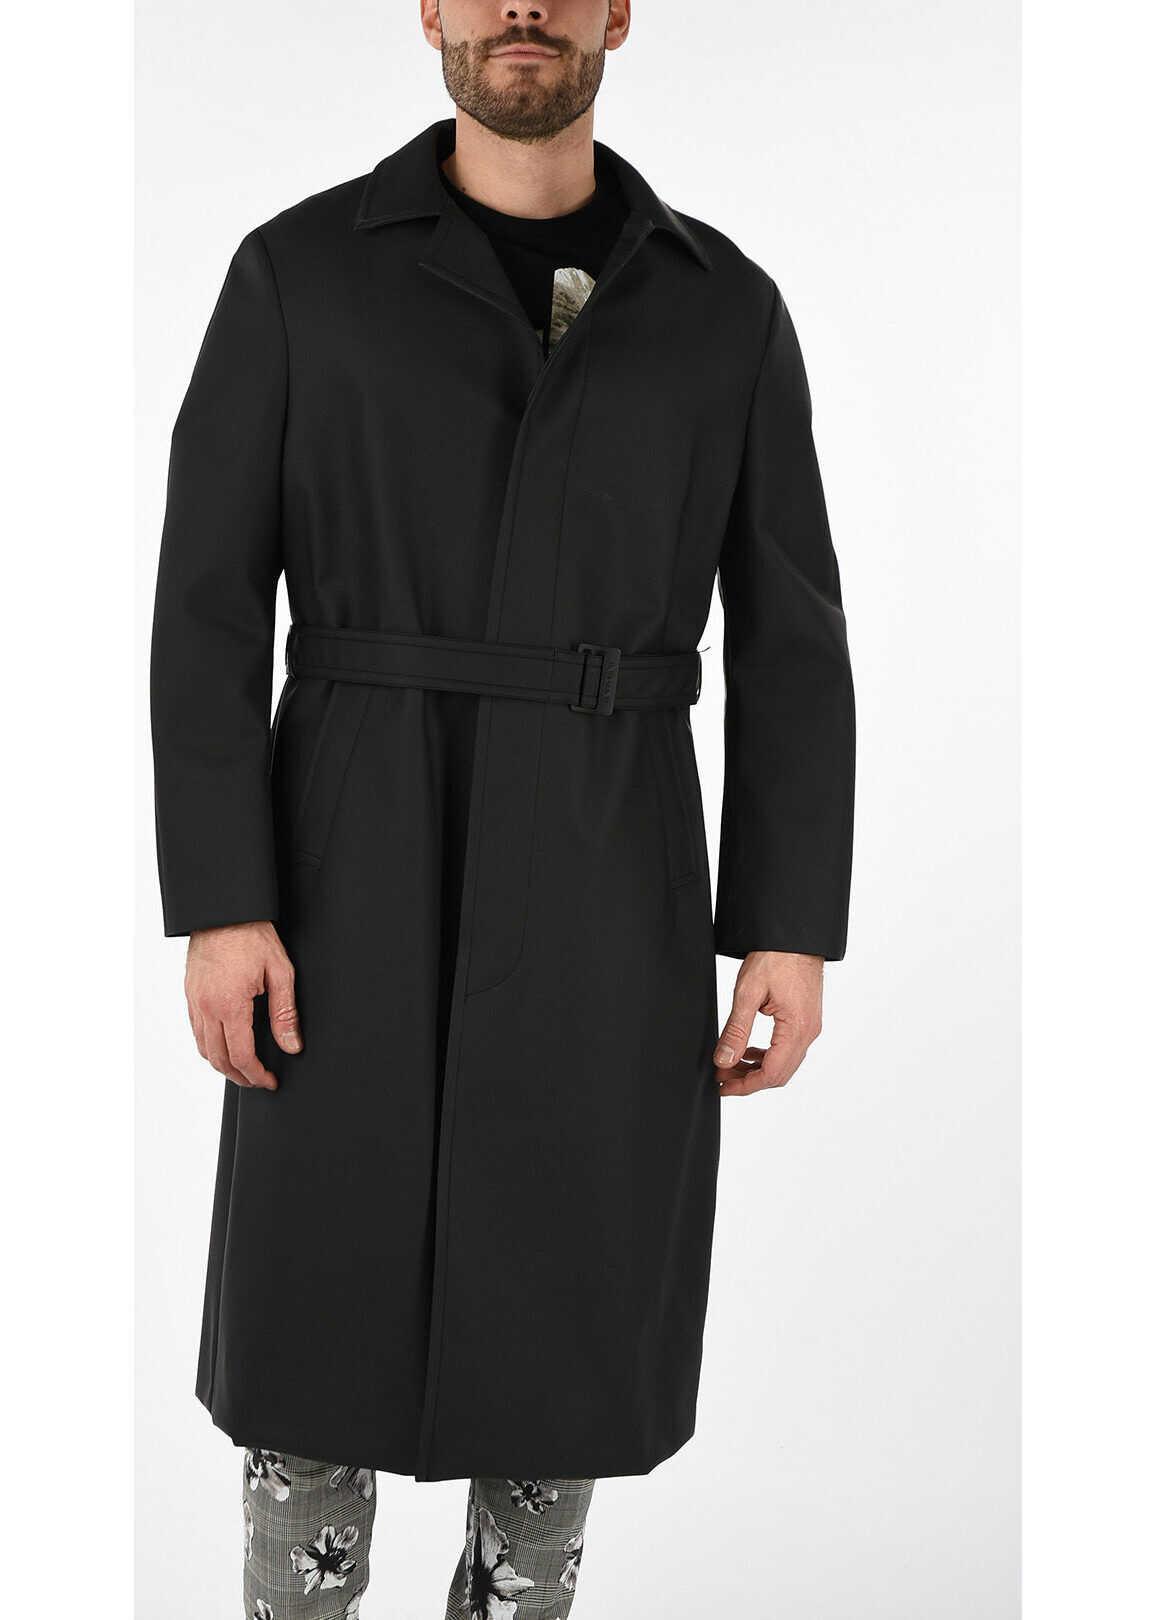 Neil Barrett Waterproof Raincoat BLACK